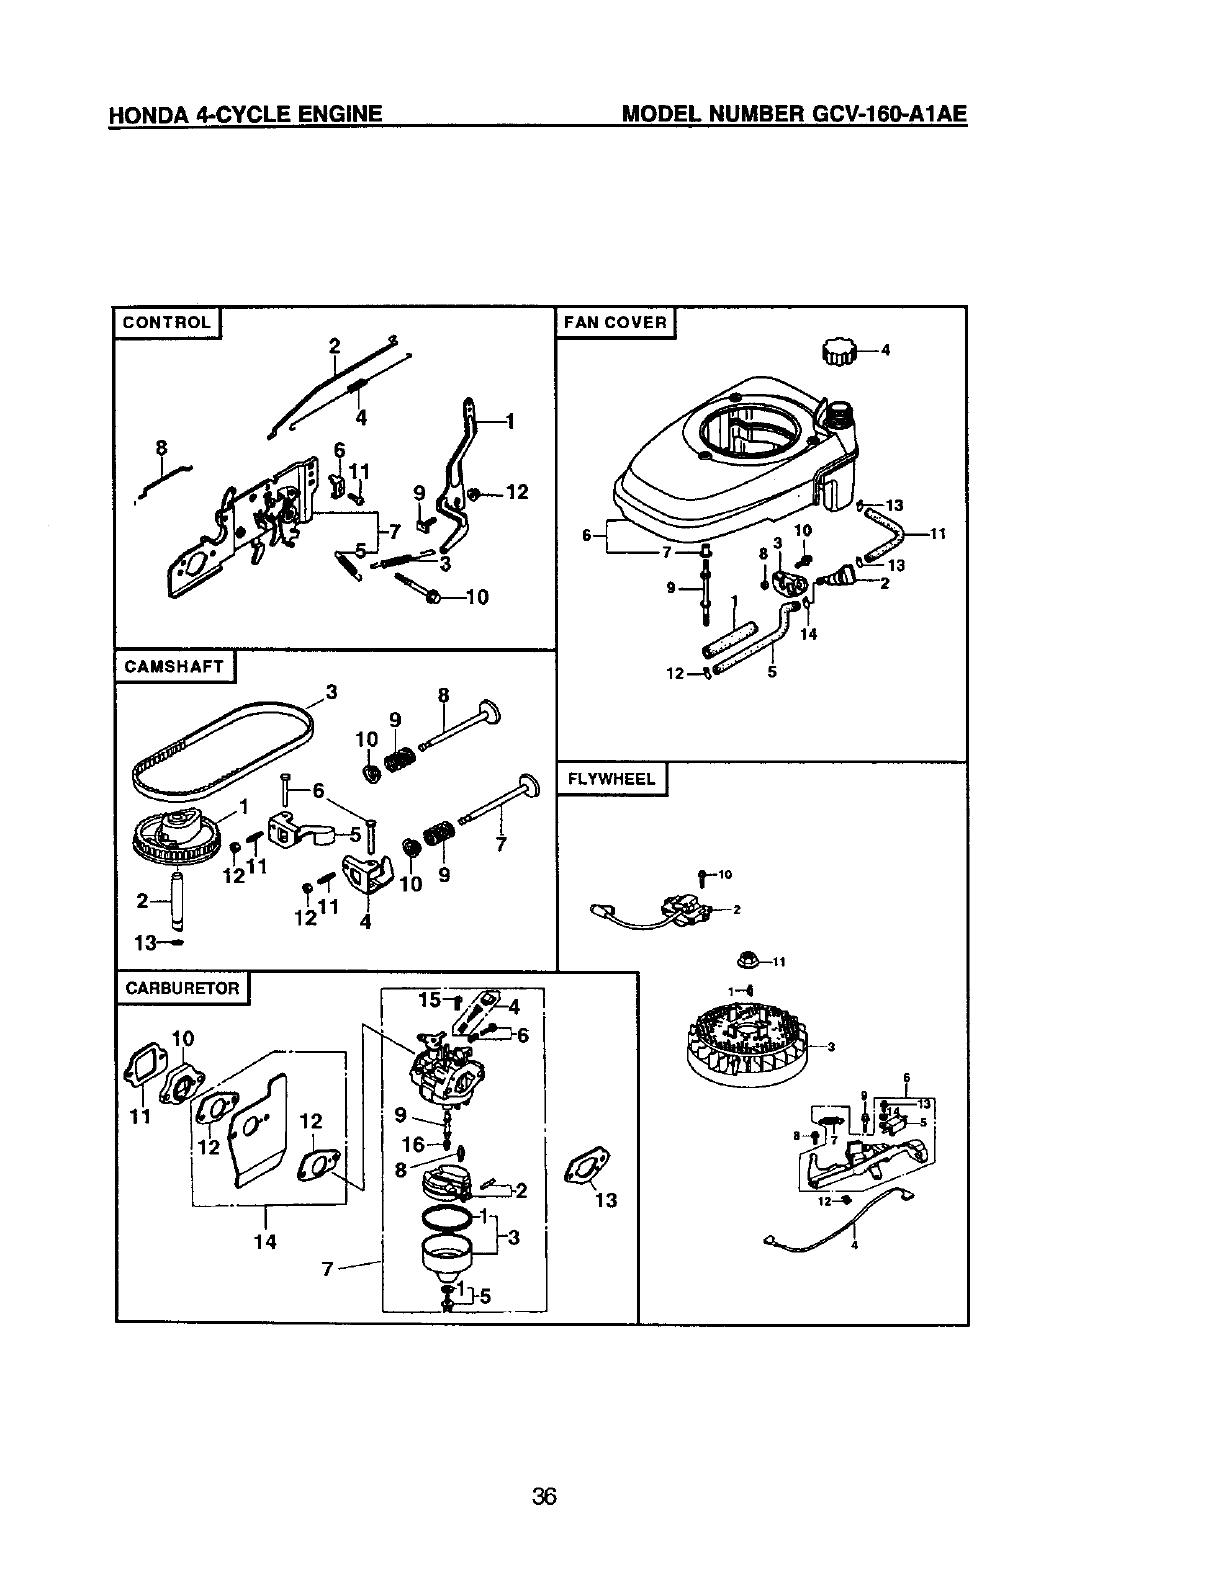 Craftsman 917388800 User Manual Gas, Walk Behind Lawnmower